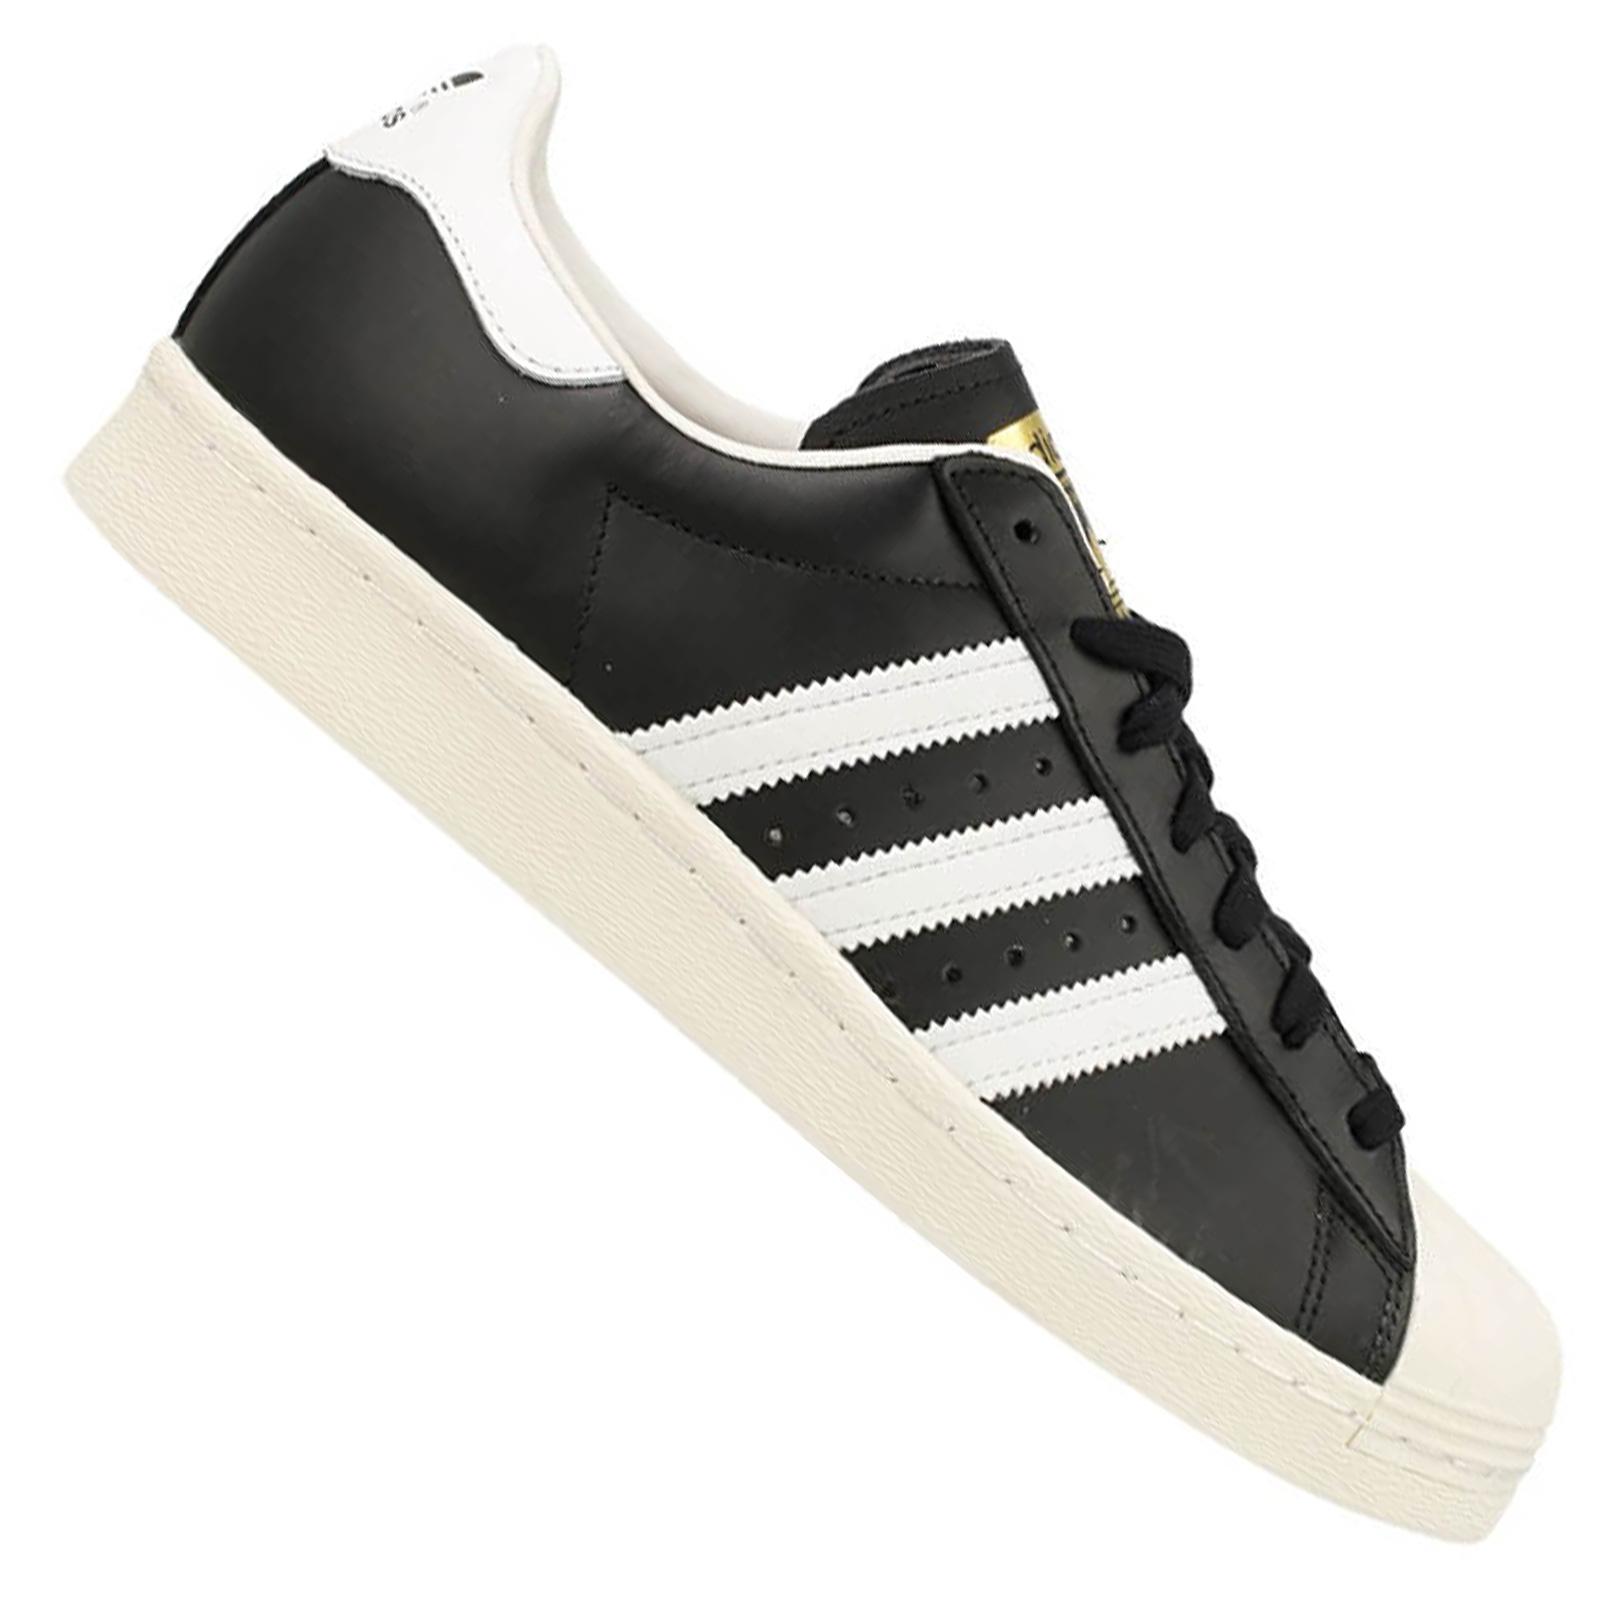 detailed look d2367 aafef adidas Retro Unisex Superstar 80s Sneaker Schuhe Leder Schwarz Weiß Gold  G61069